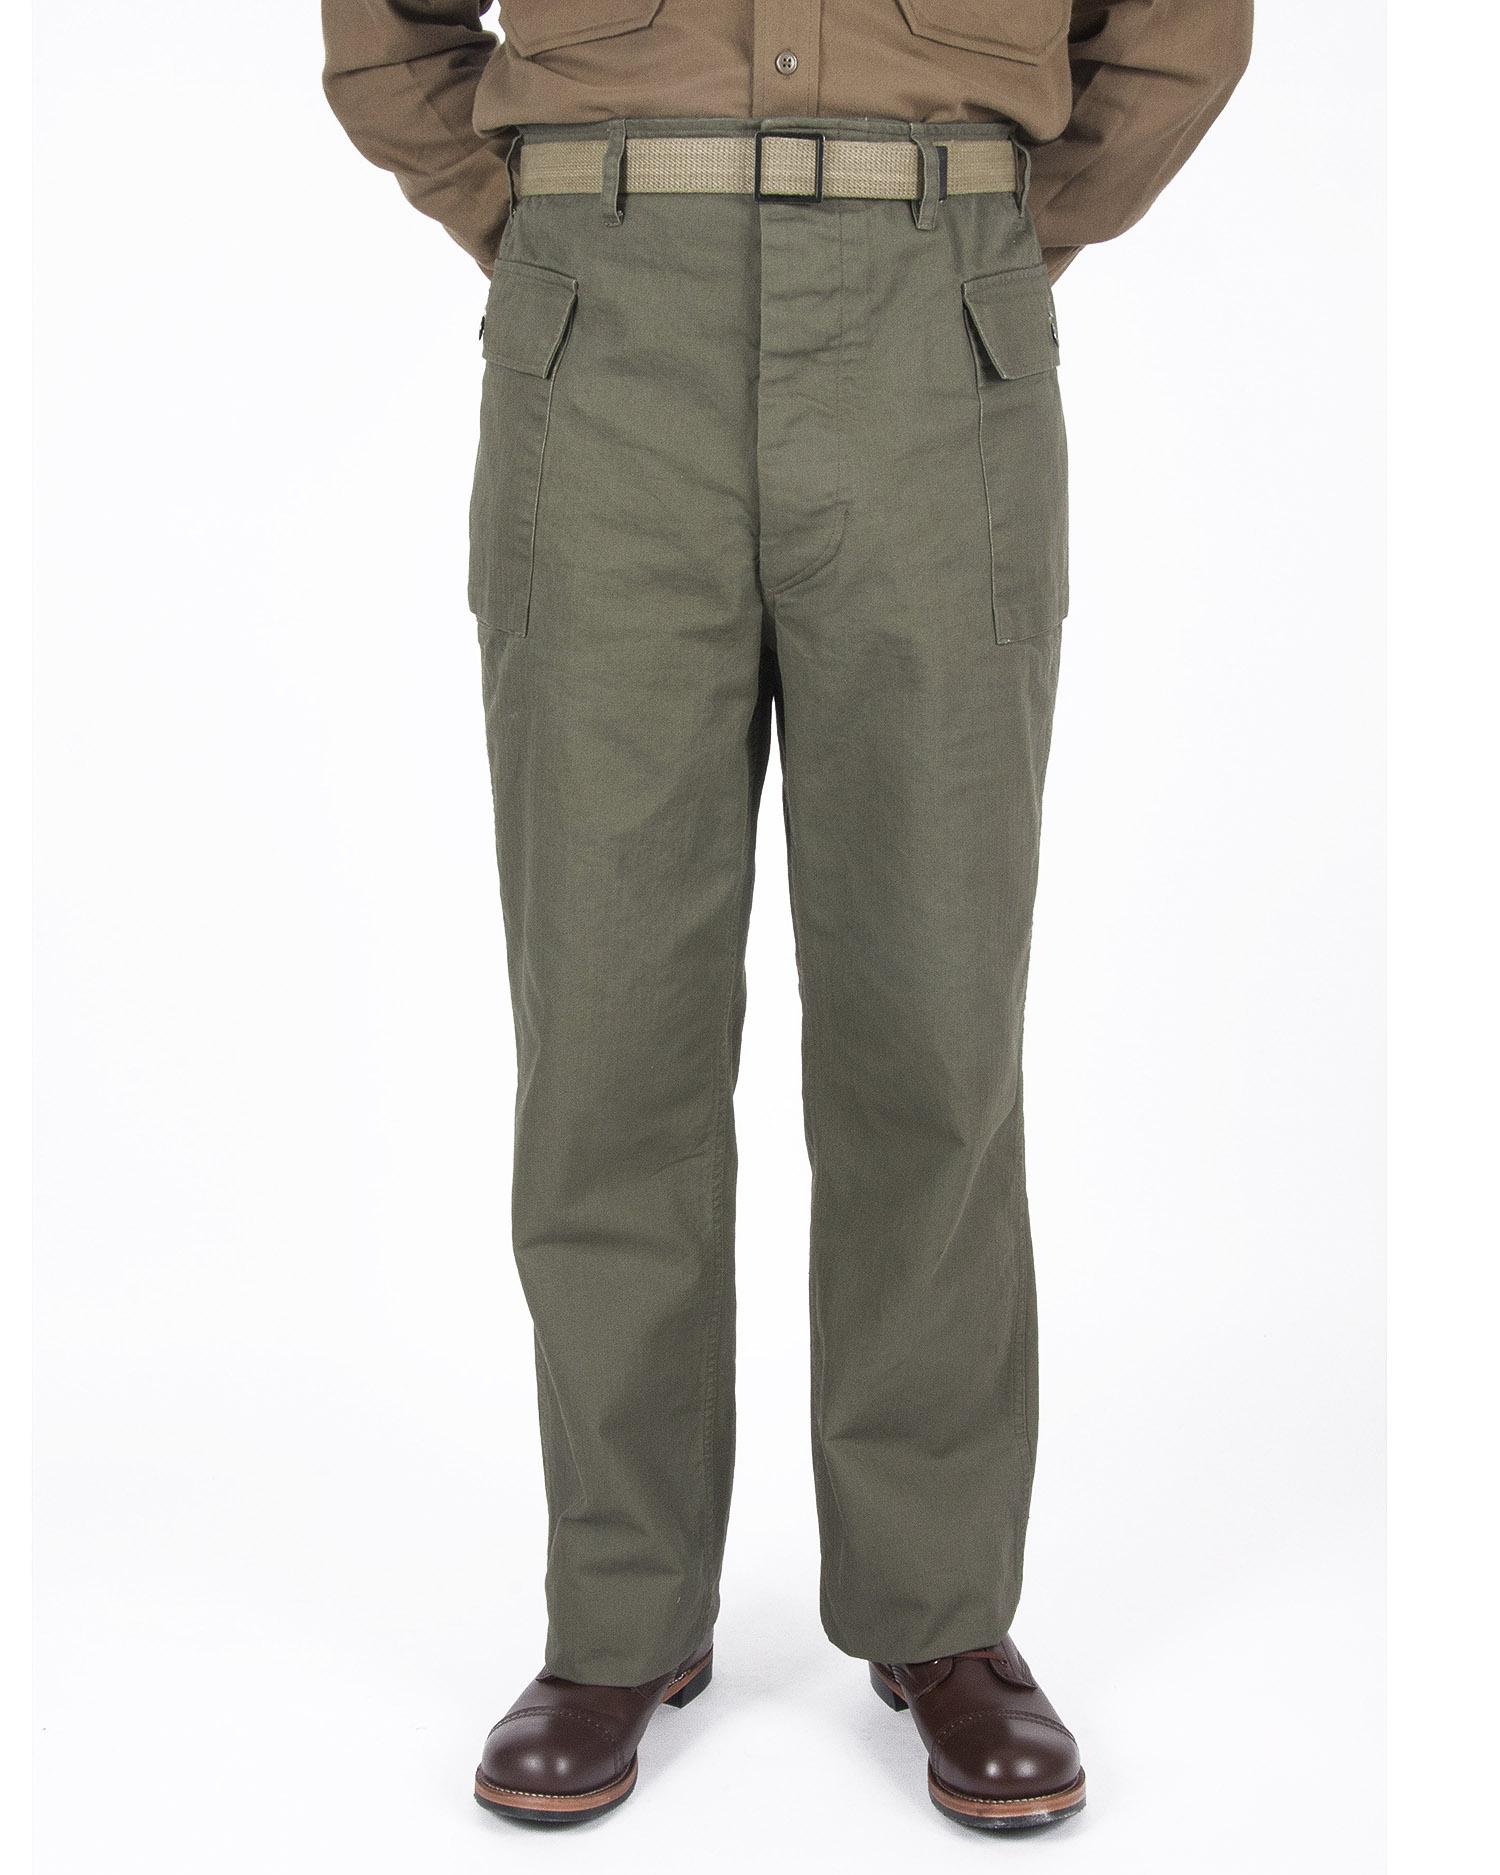 U.S. WWII Herringbone Twill trousers HBT men